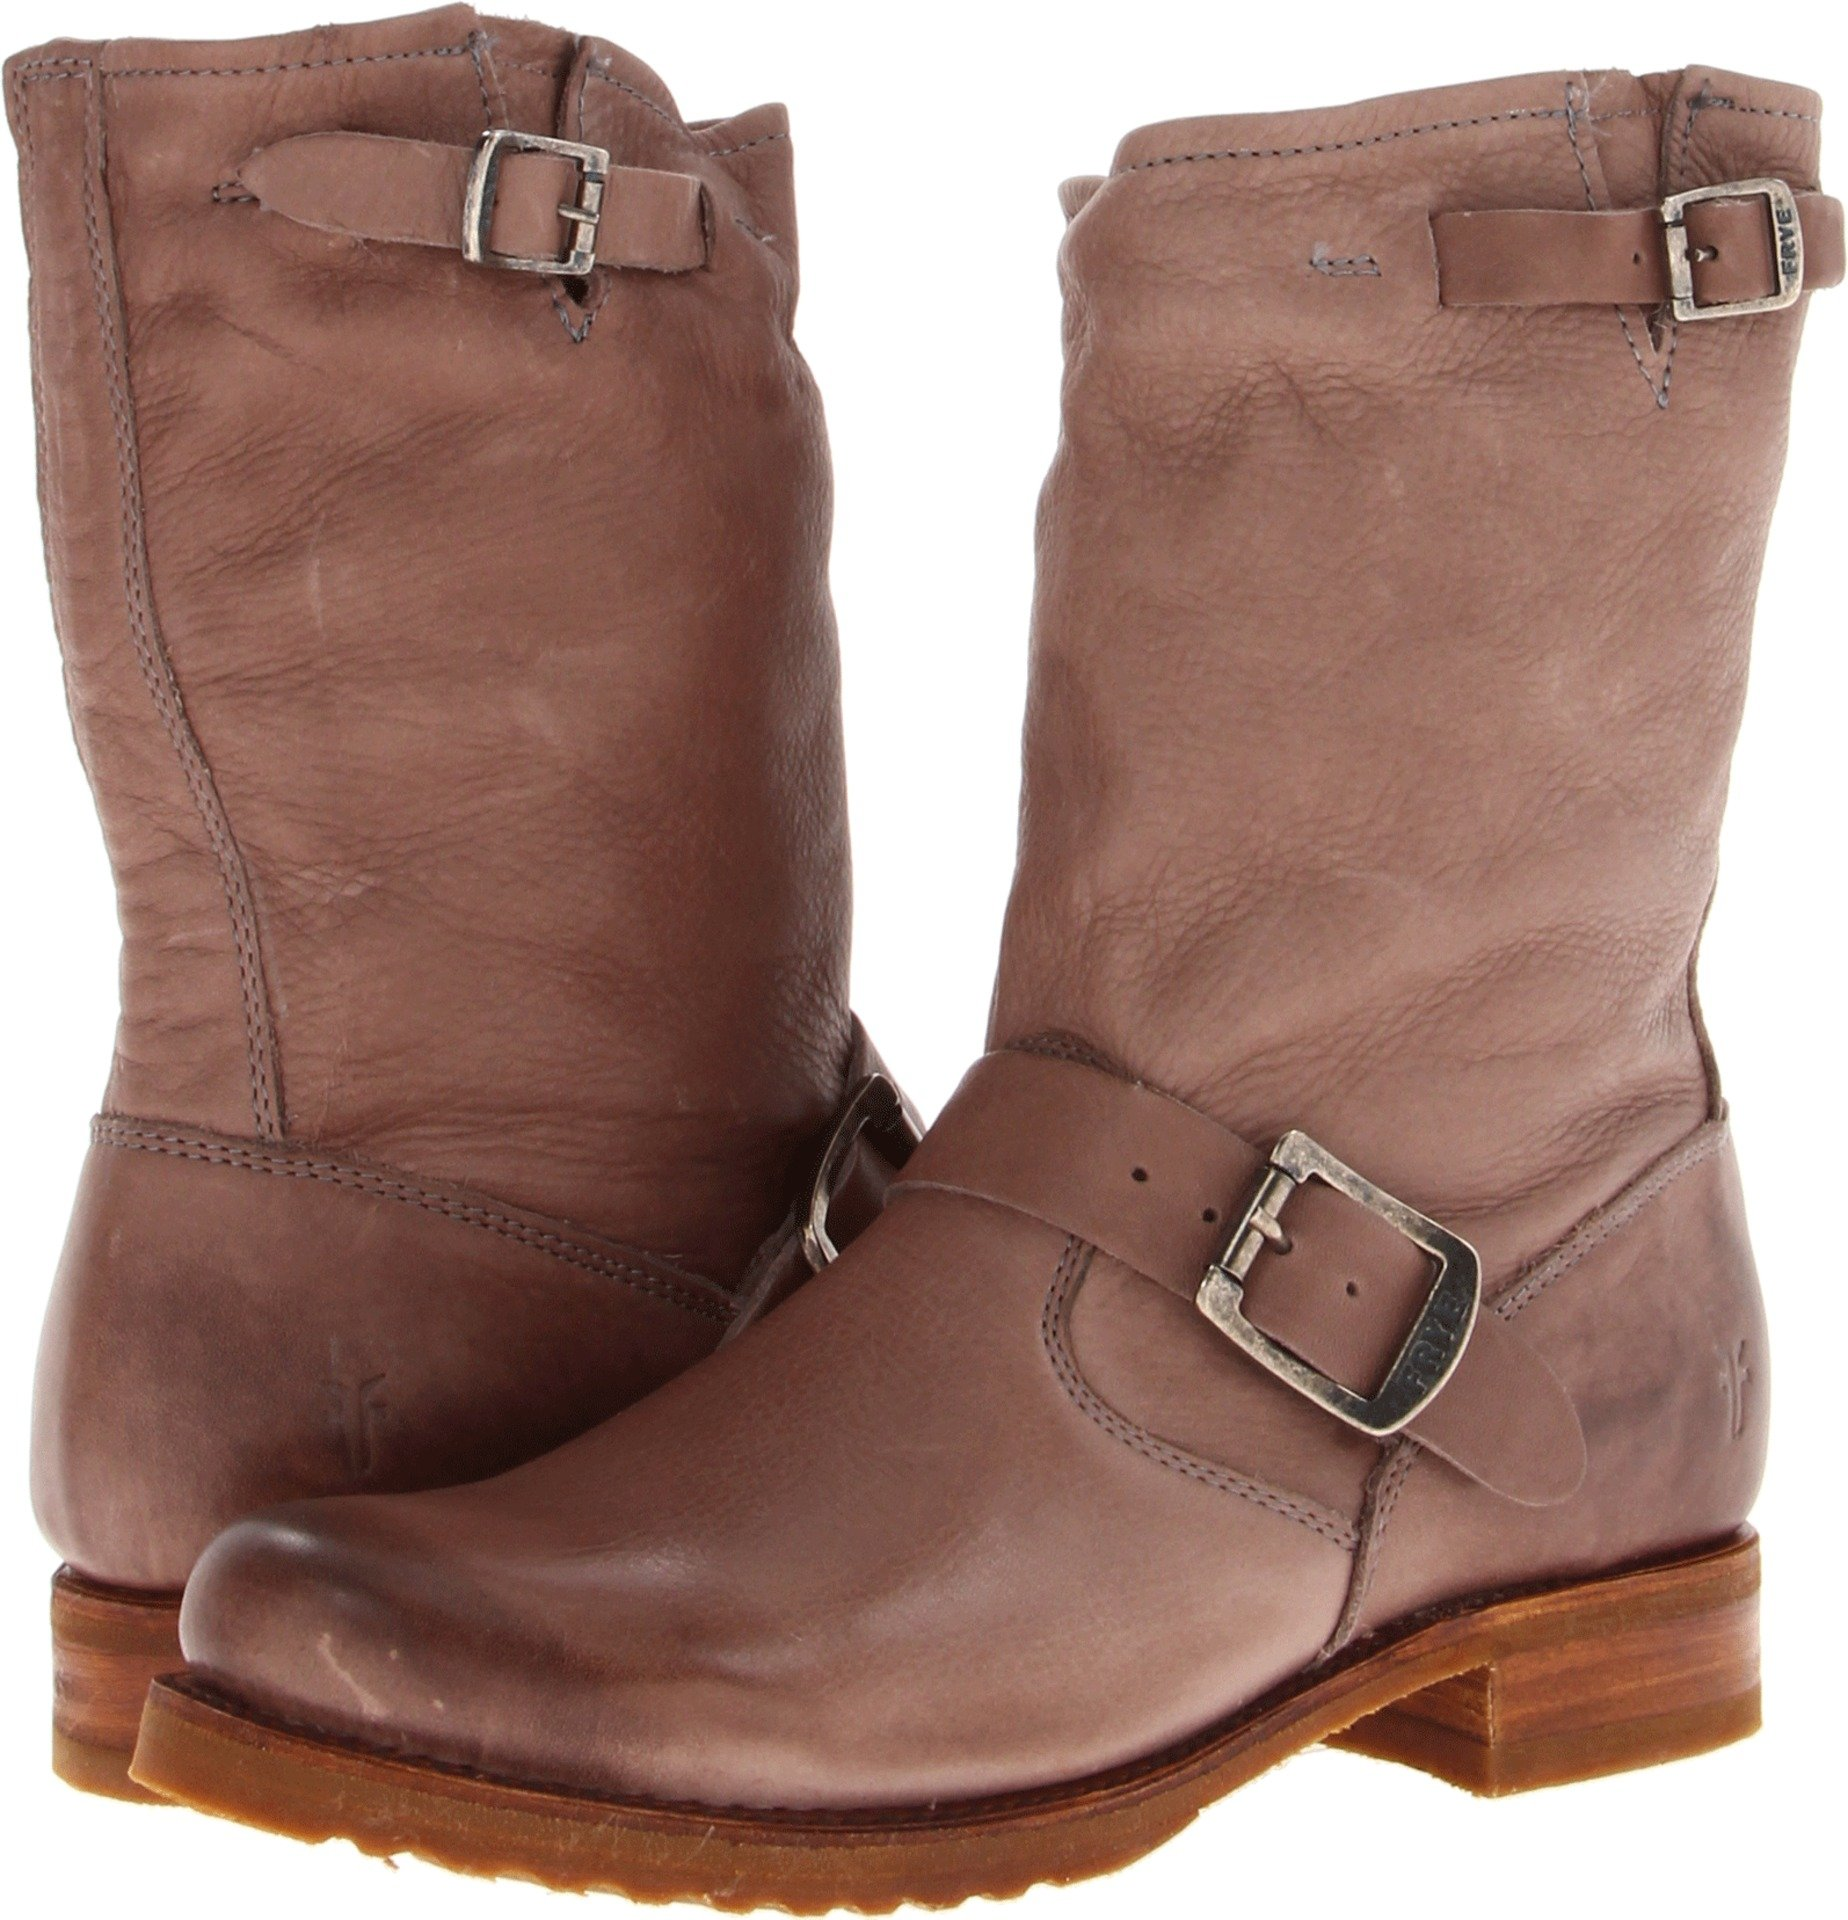 FRYE Women's Veronica Short Boot, Grey Soft Vintage Leather, 6 M US